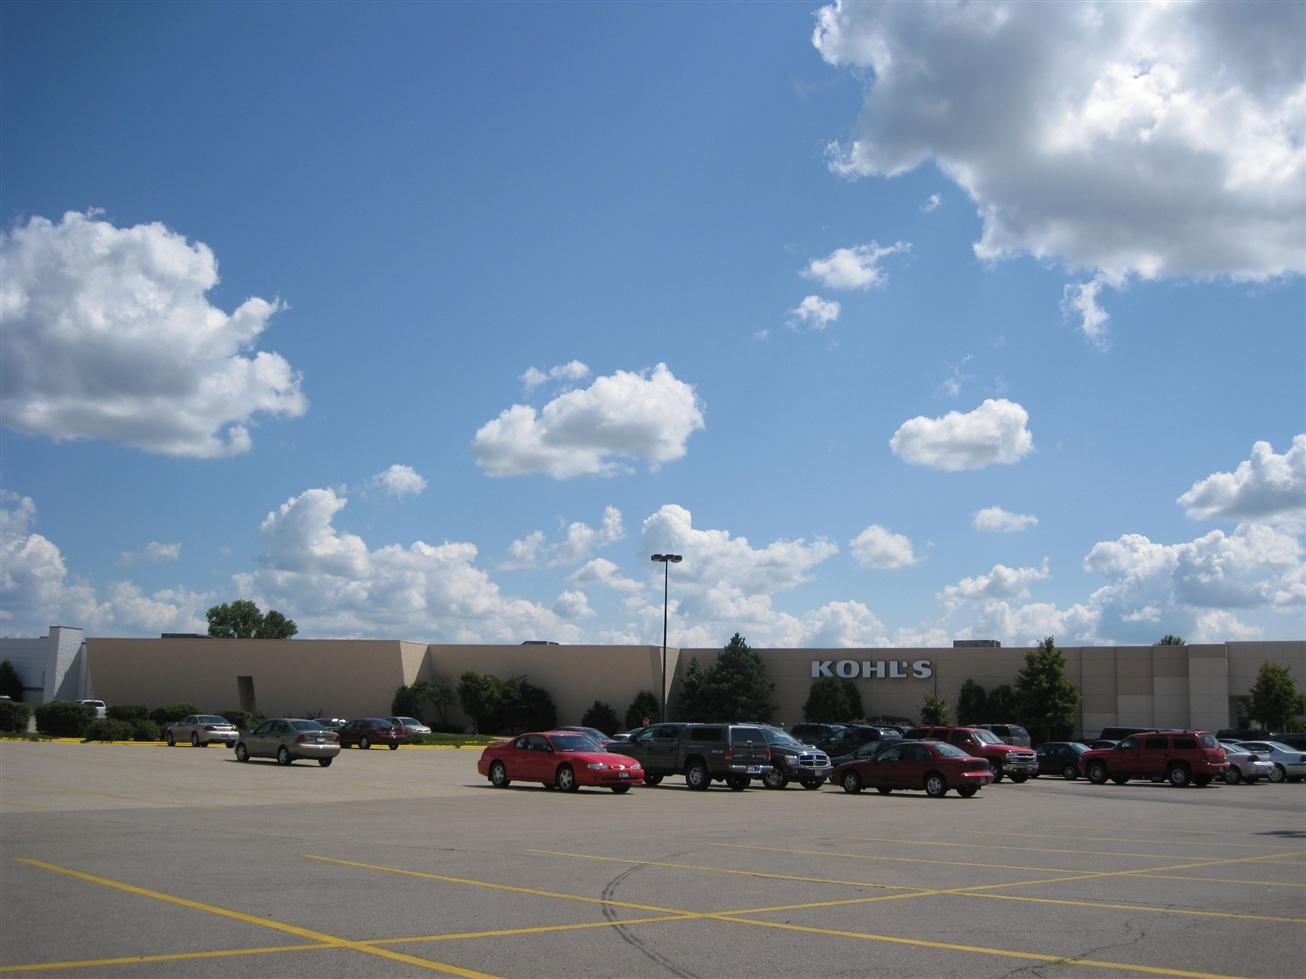 Janesville Mall Kohls in Janesville, WI